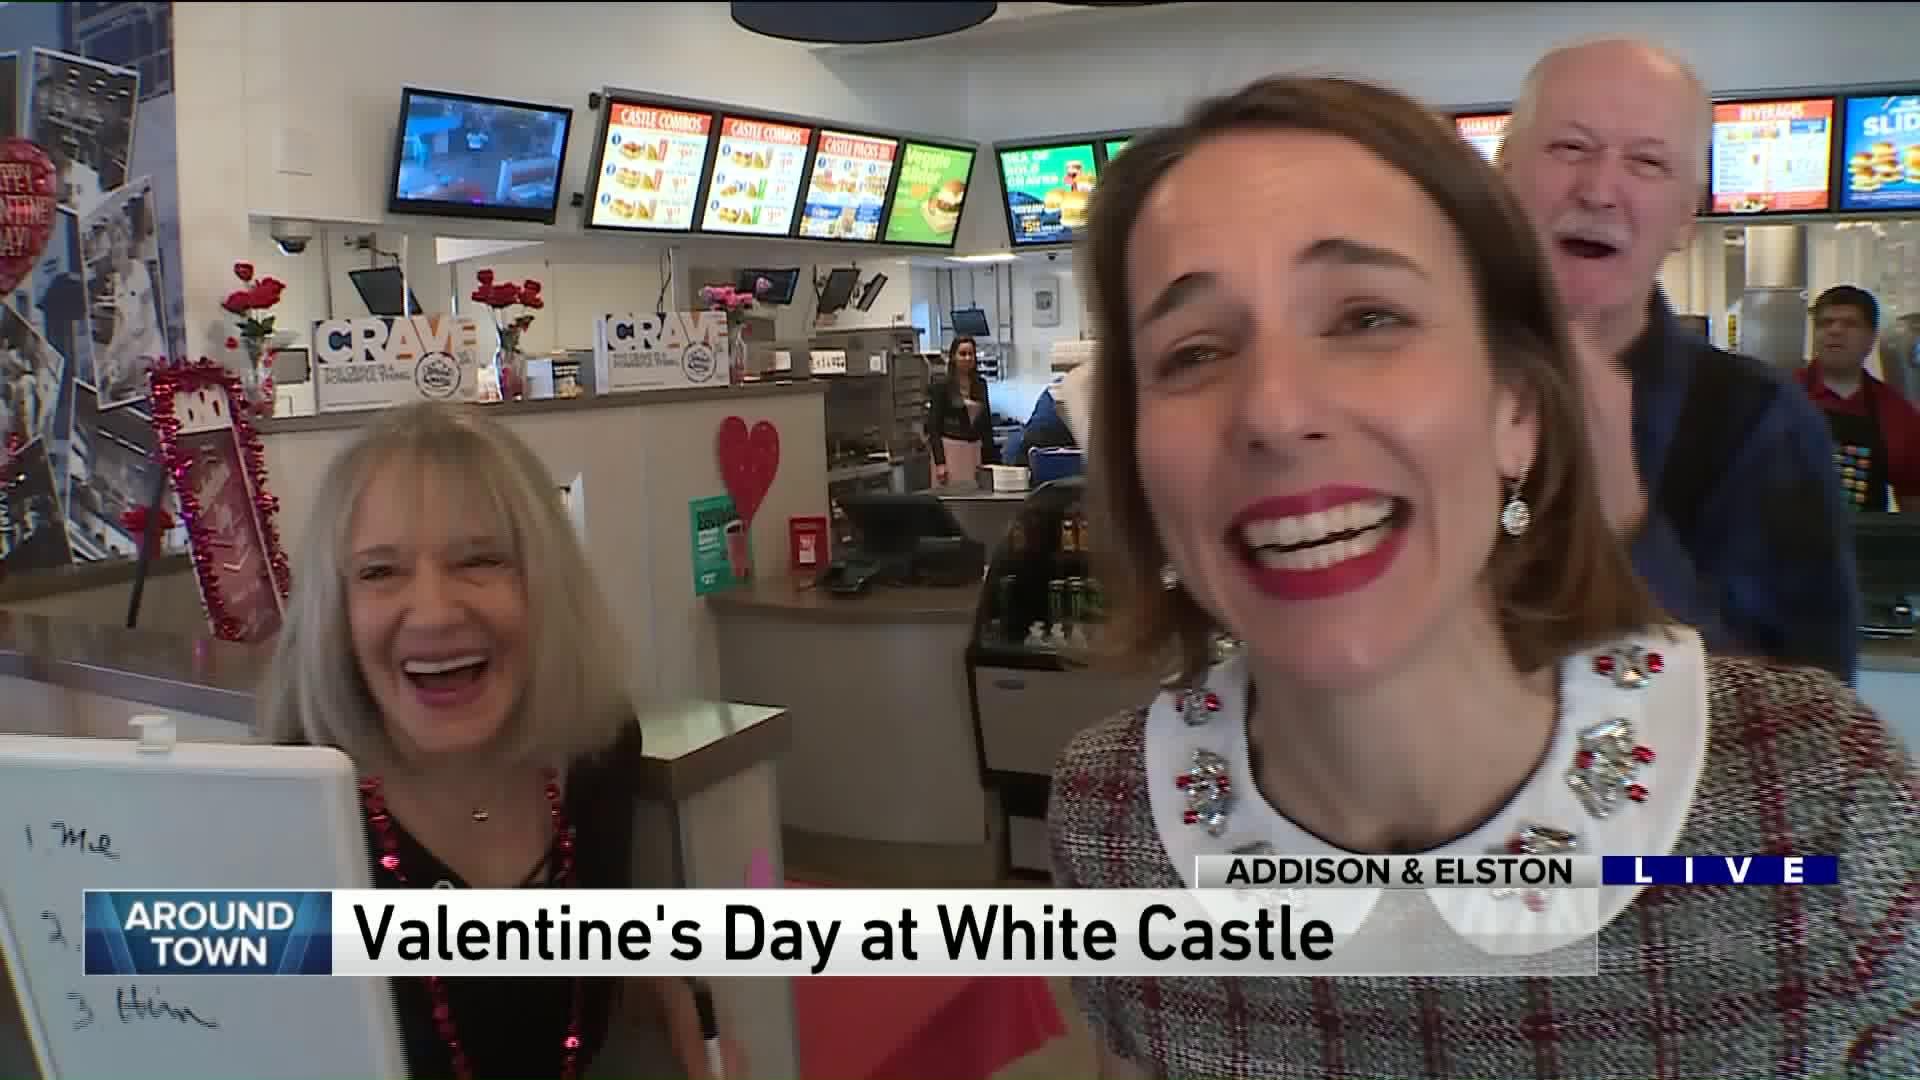 Around Town celebrates Valentine's Day at White Castle